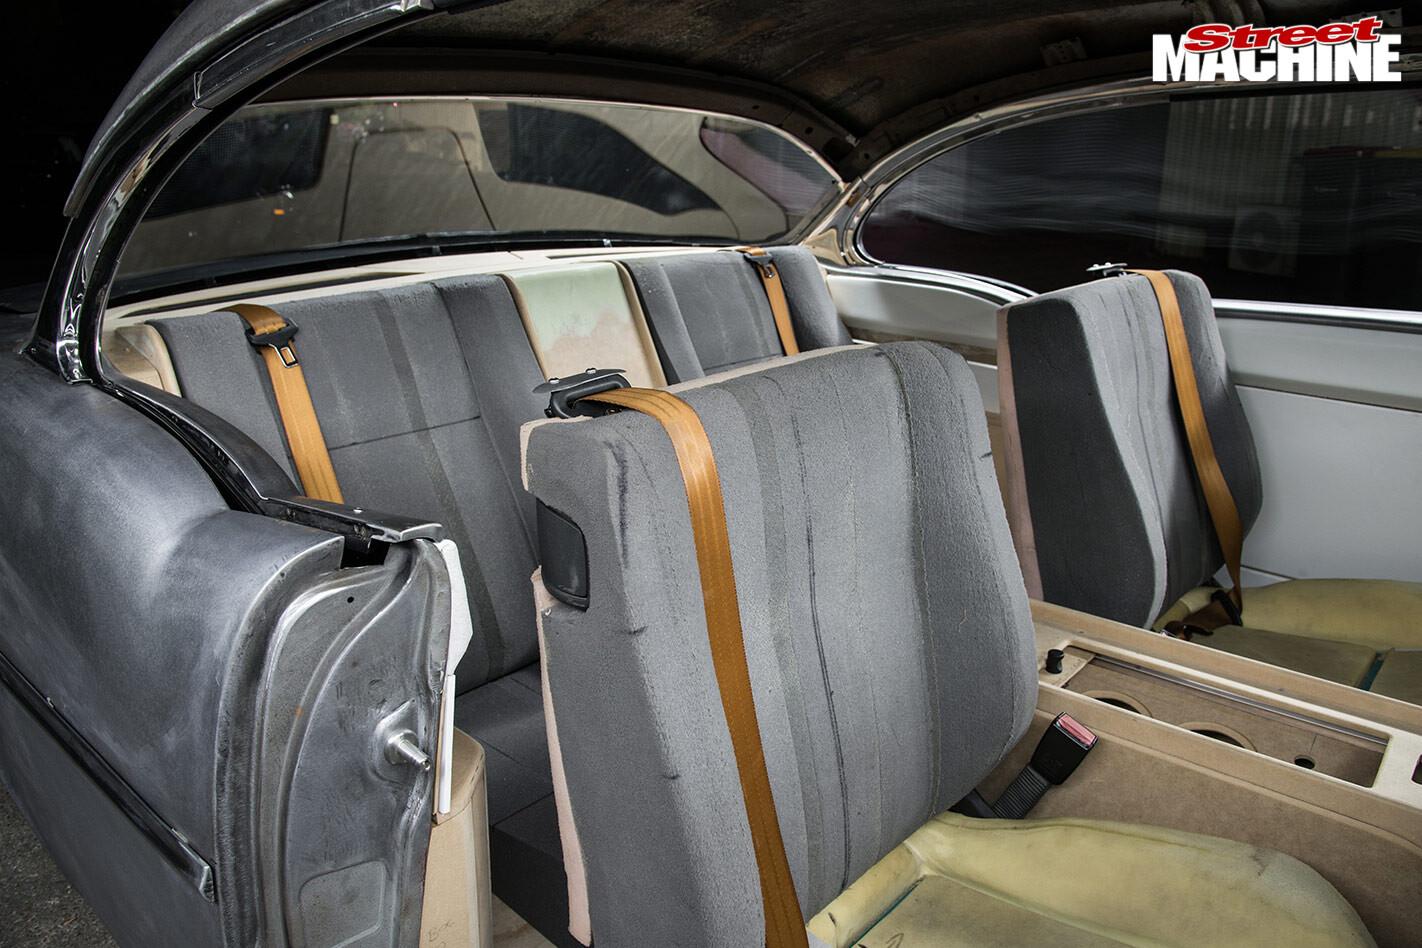 Chev Bel Air seats